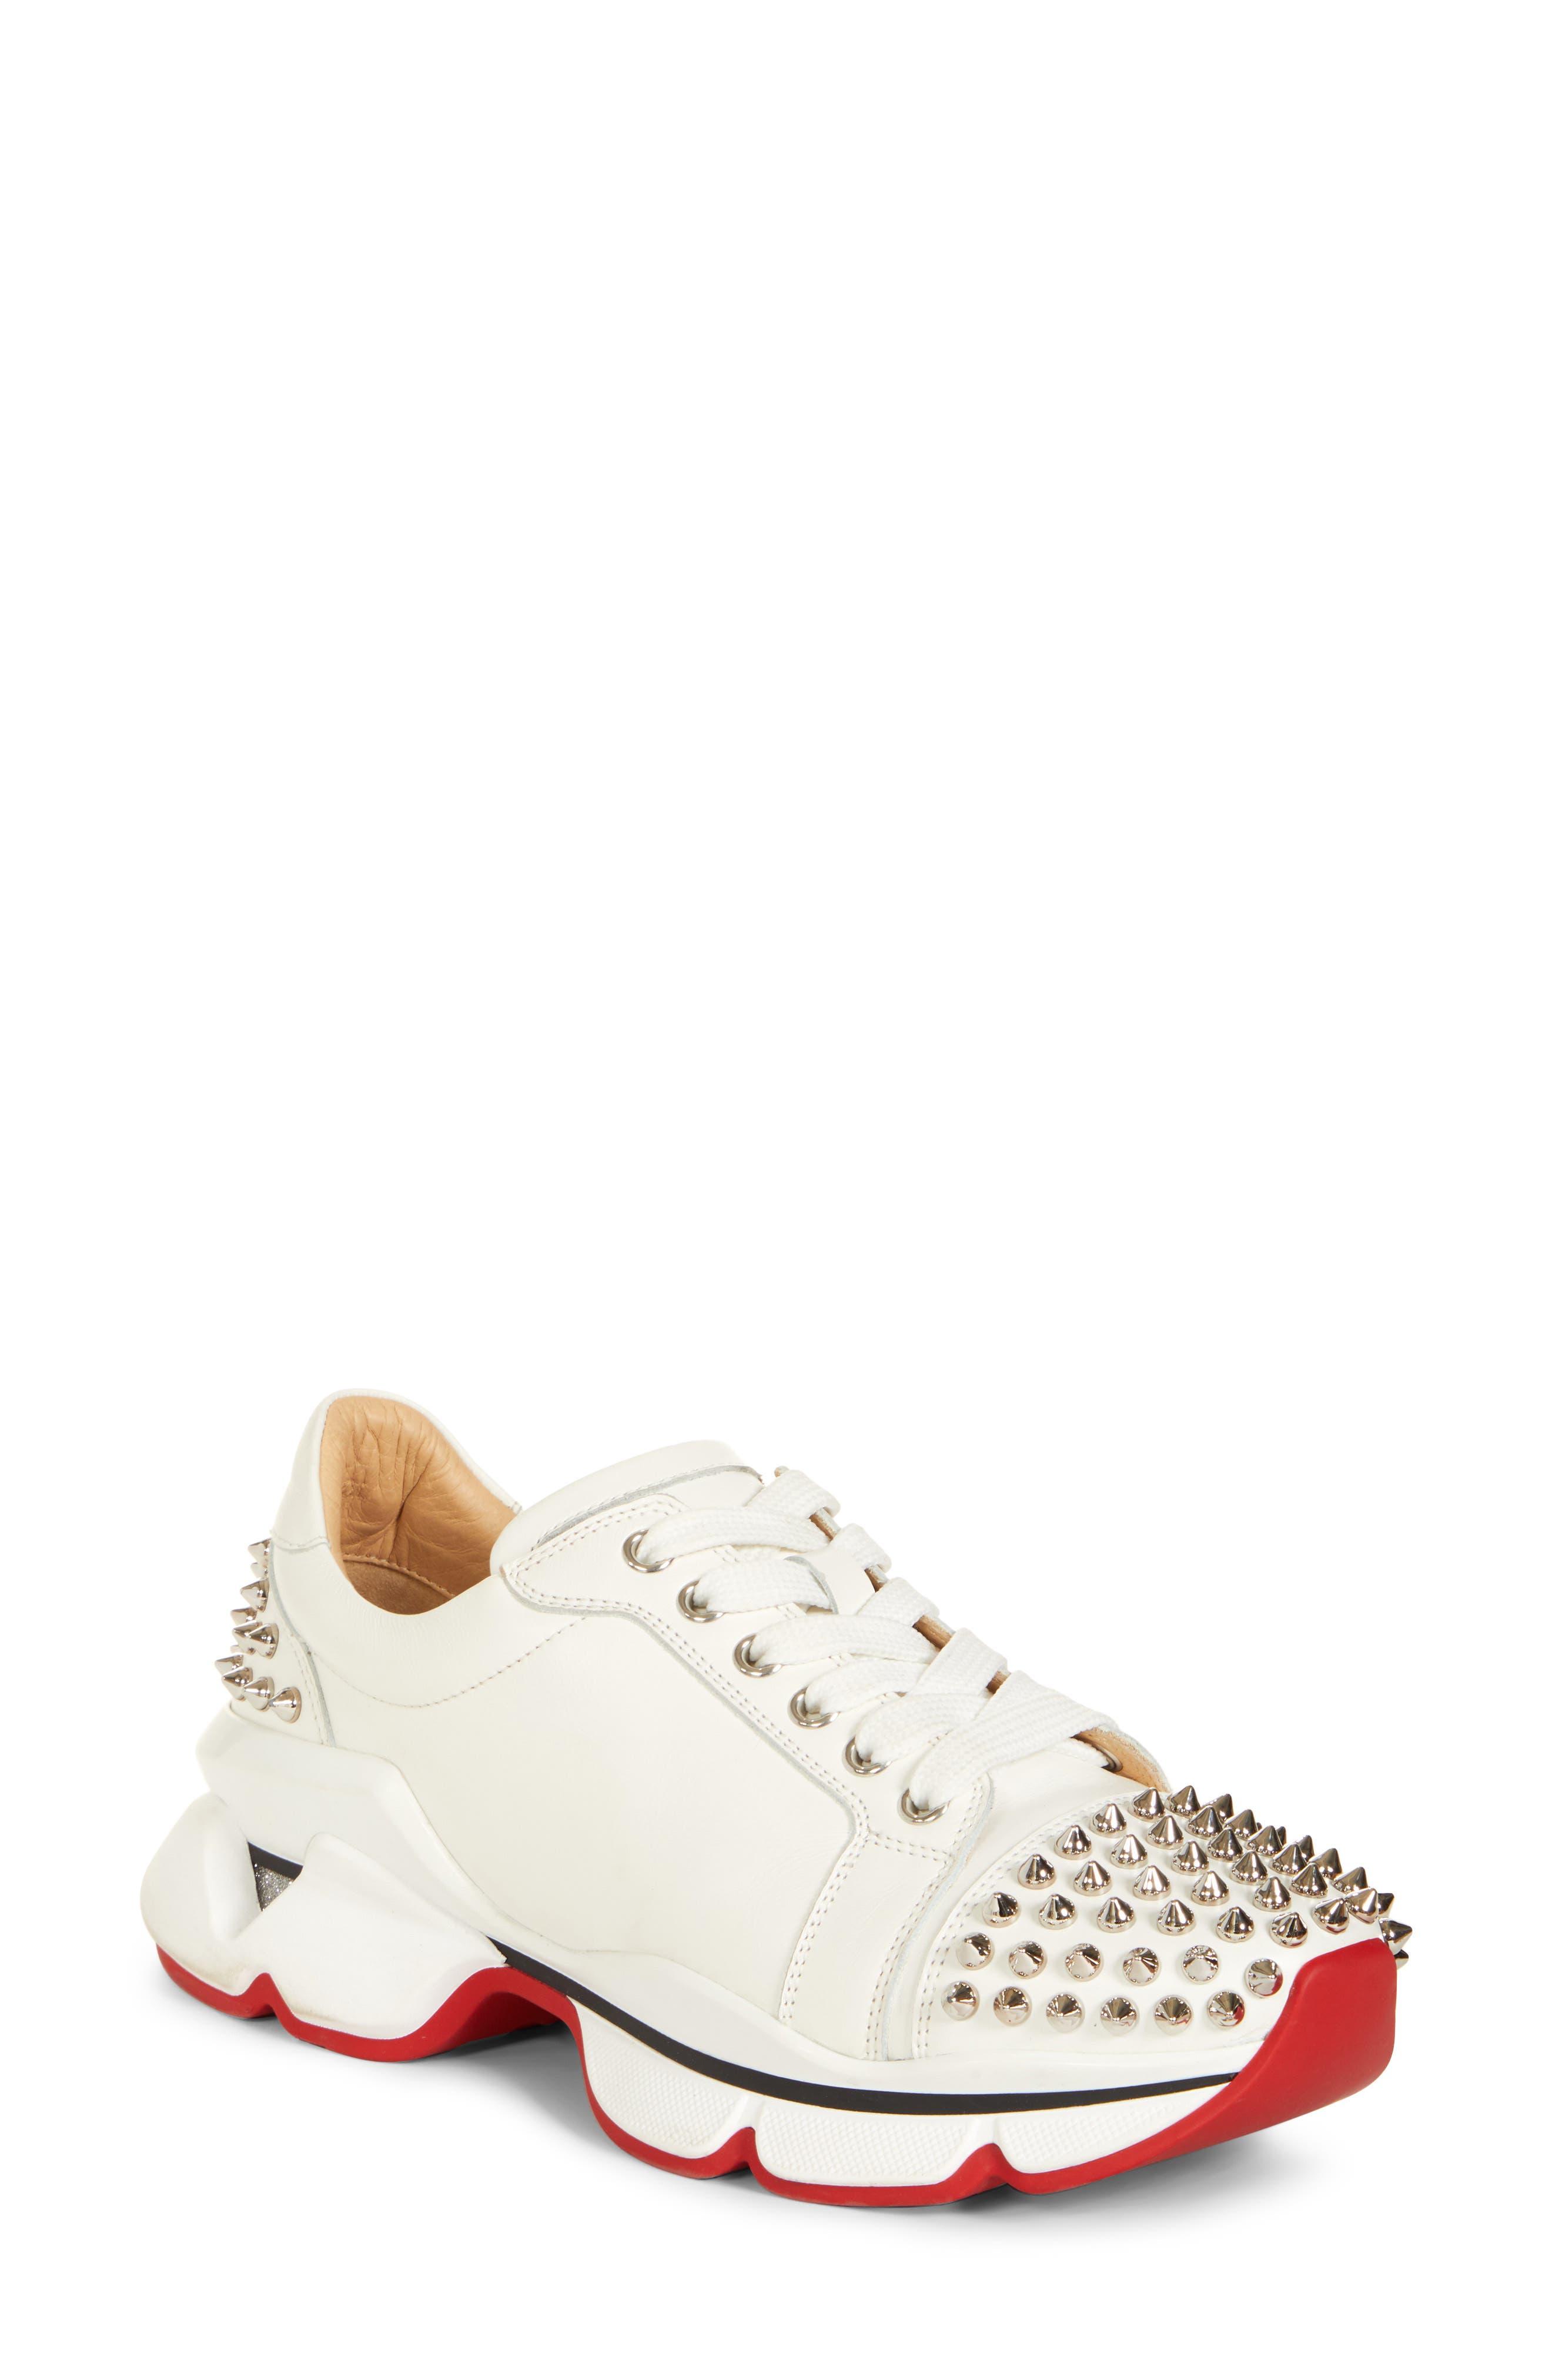 Christian Louboutin Vrs Spike Sneaker